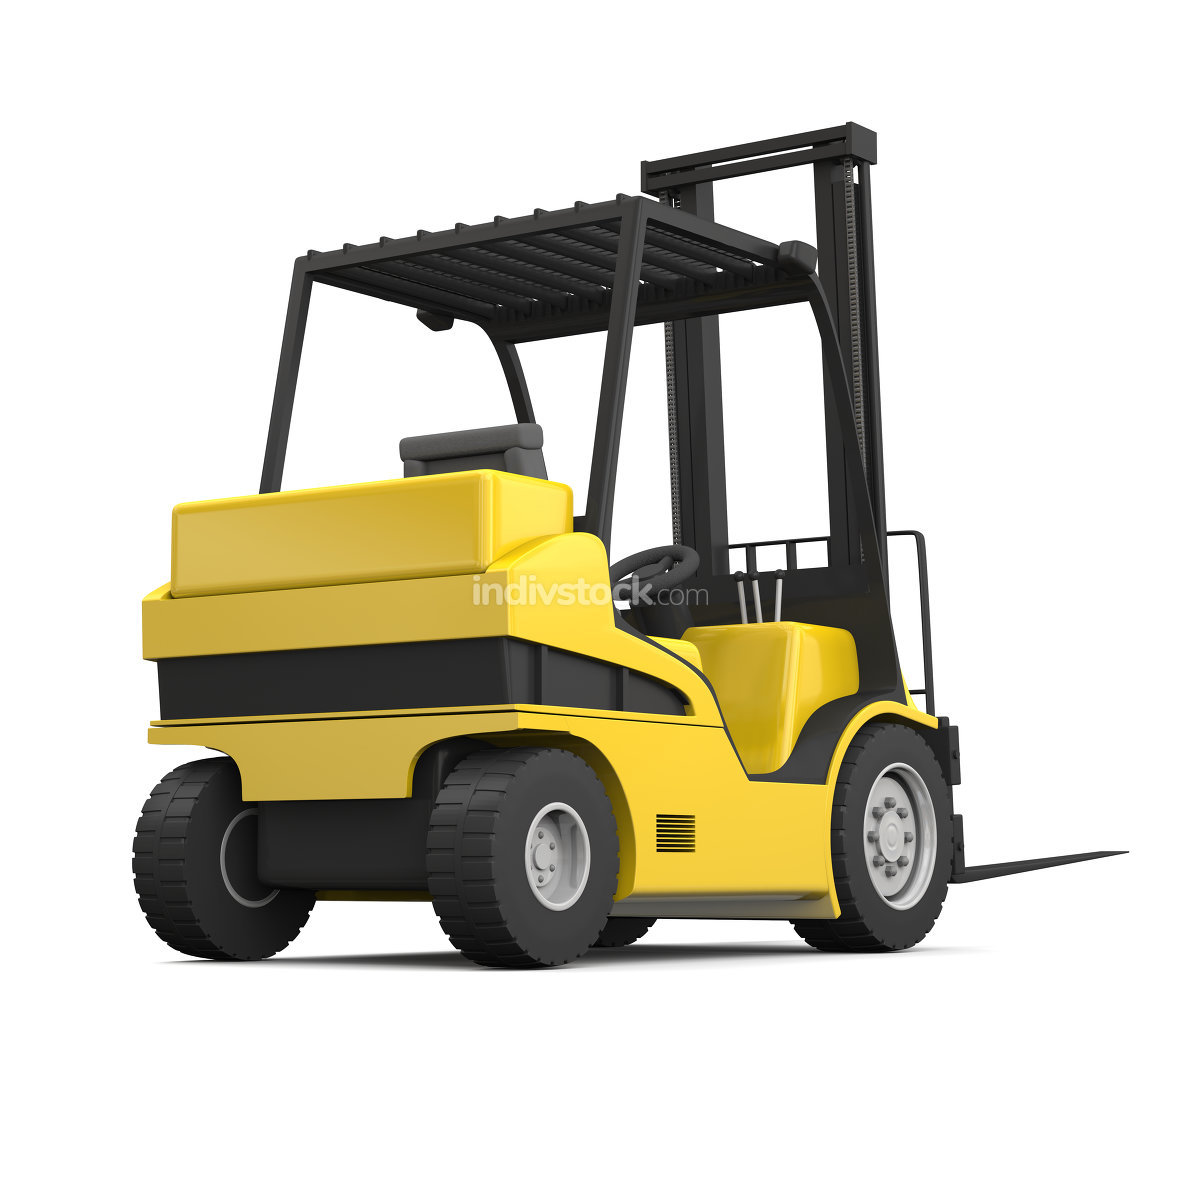 Modern yellow forklift